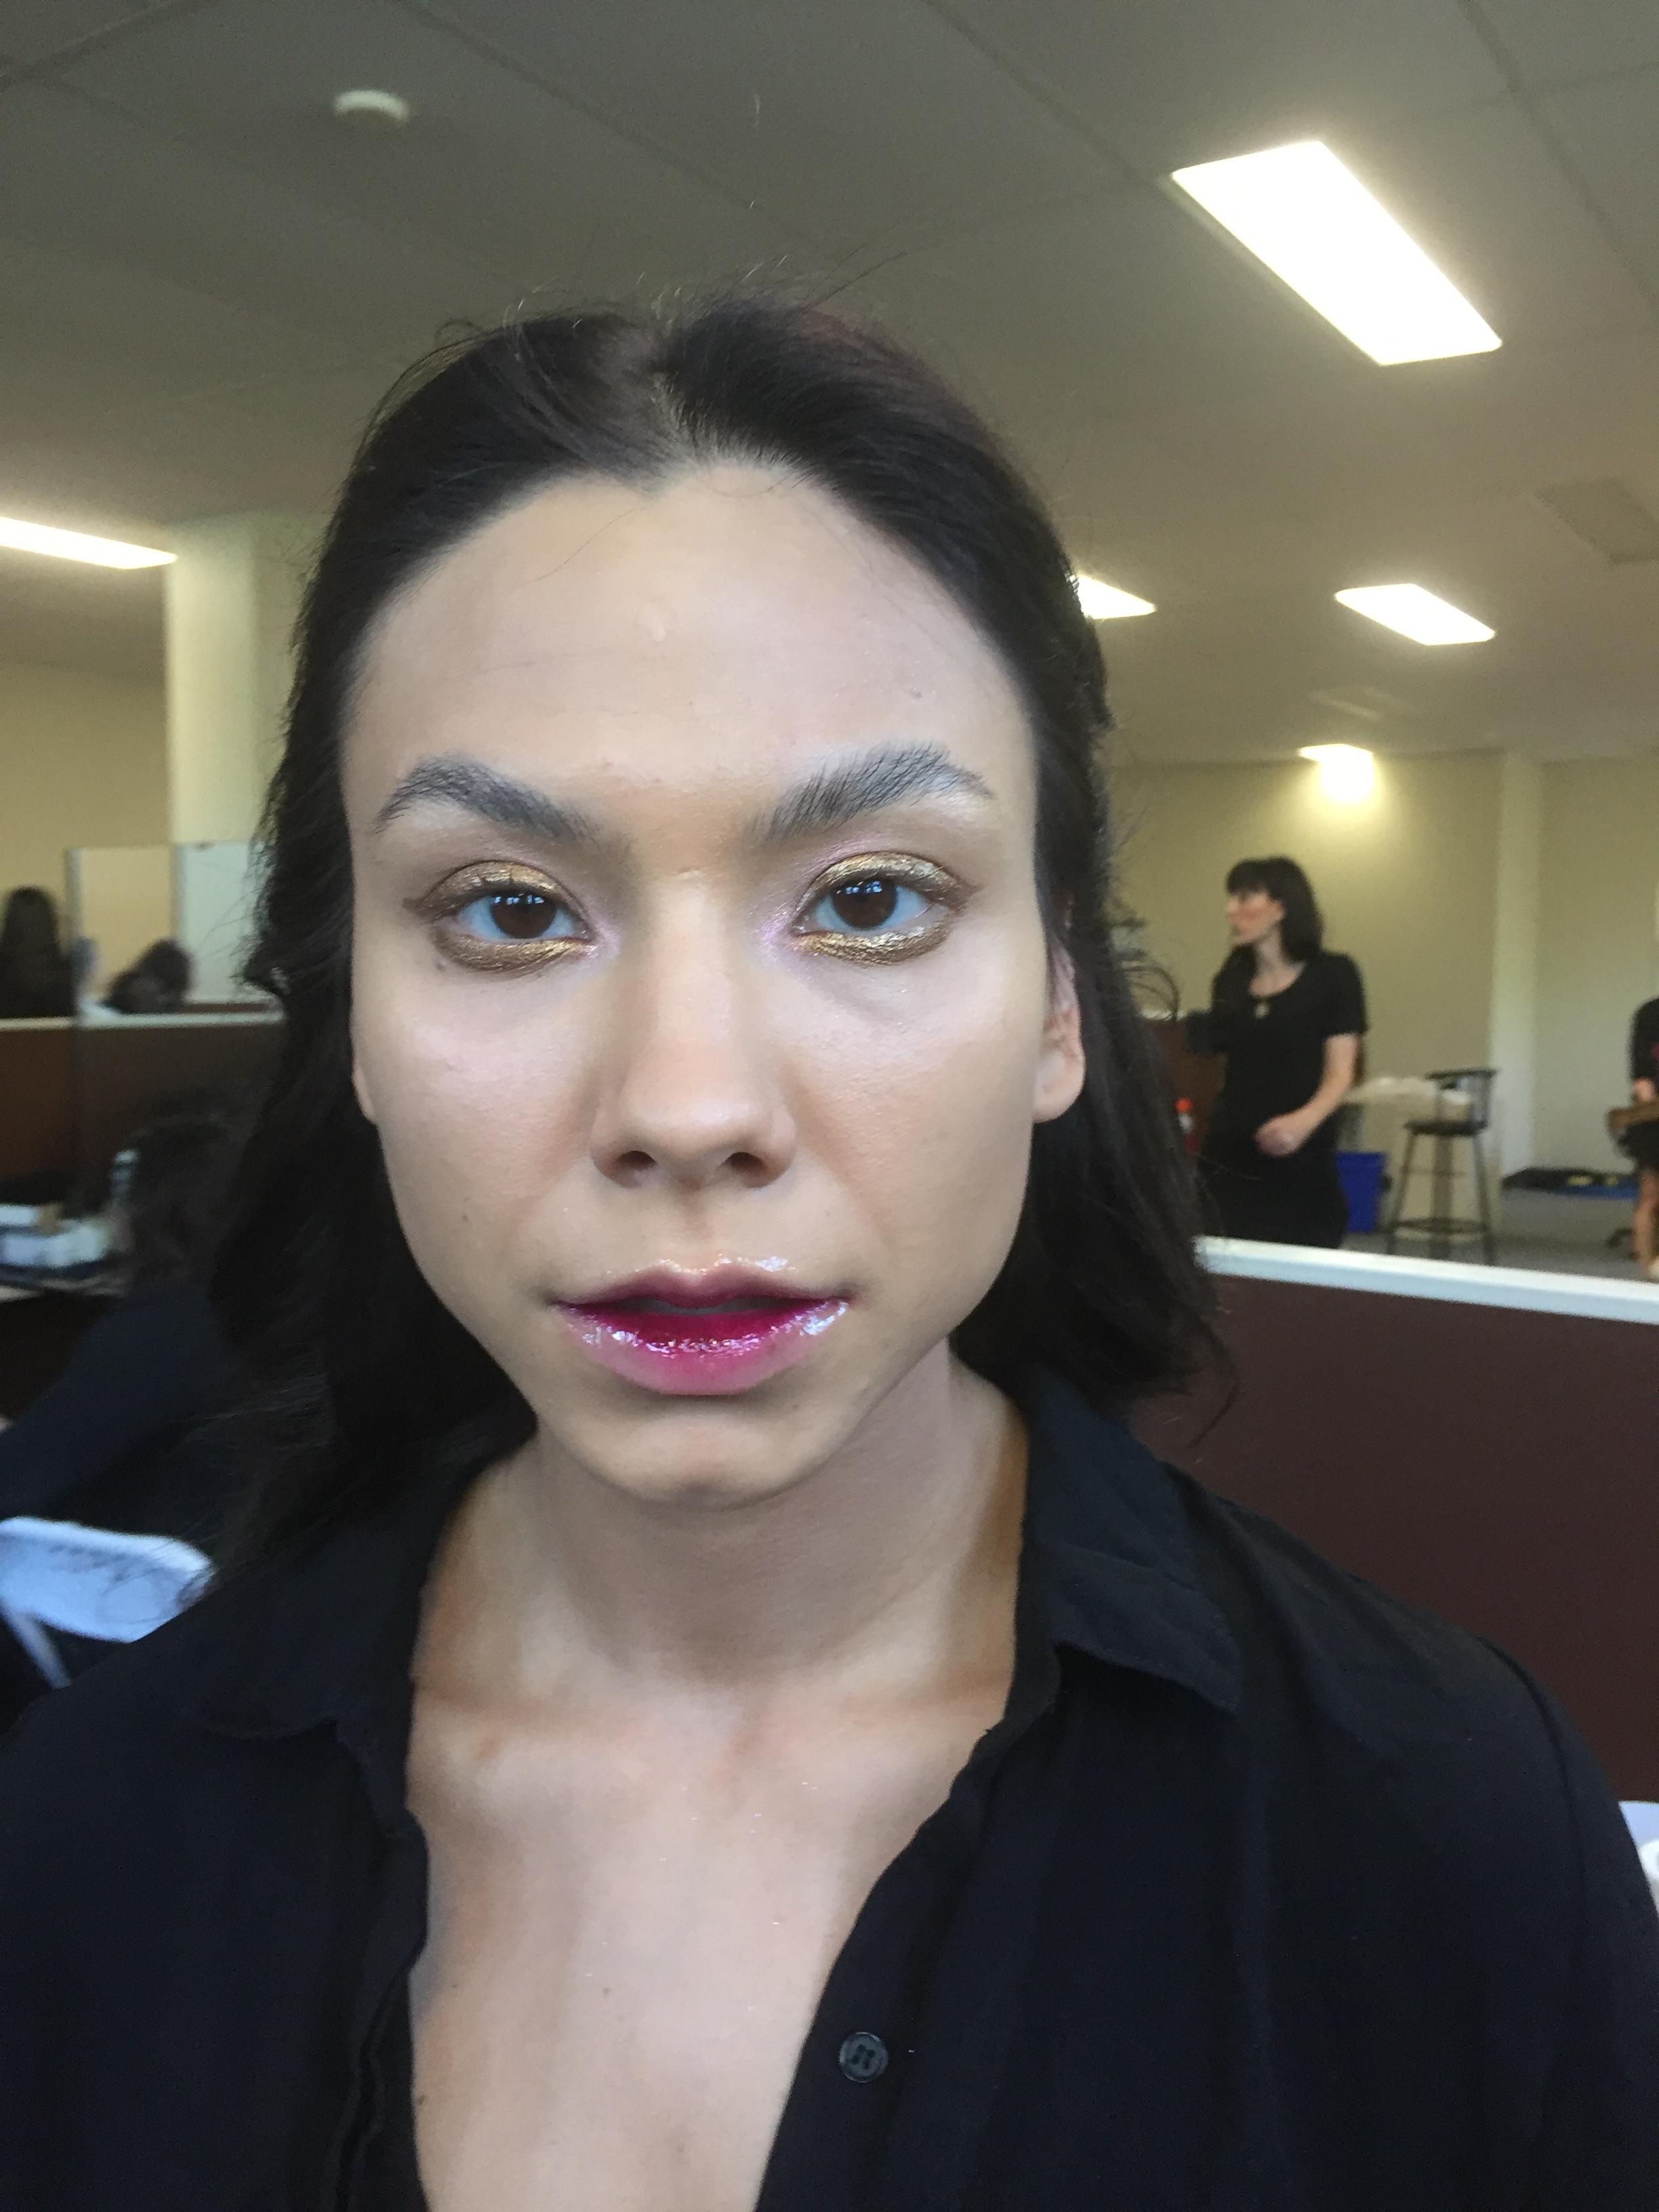 Saskatchewan Fashion Week 2017  Makeup Look Created by: Sara Lindsay  Executed by: Samantha Tran